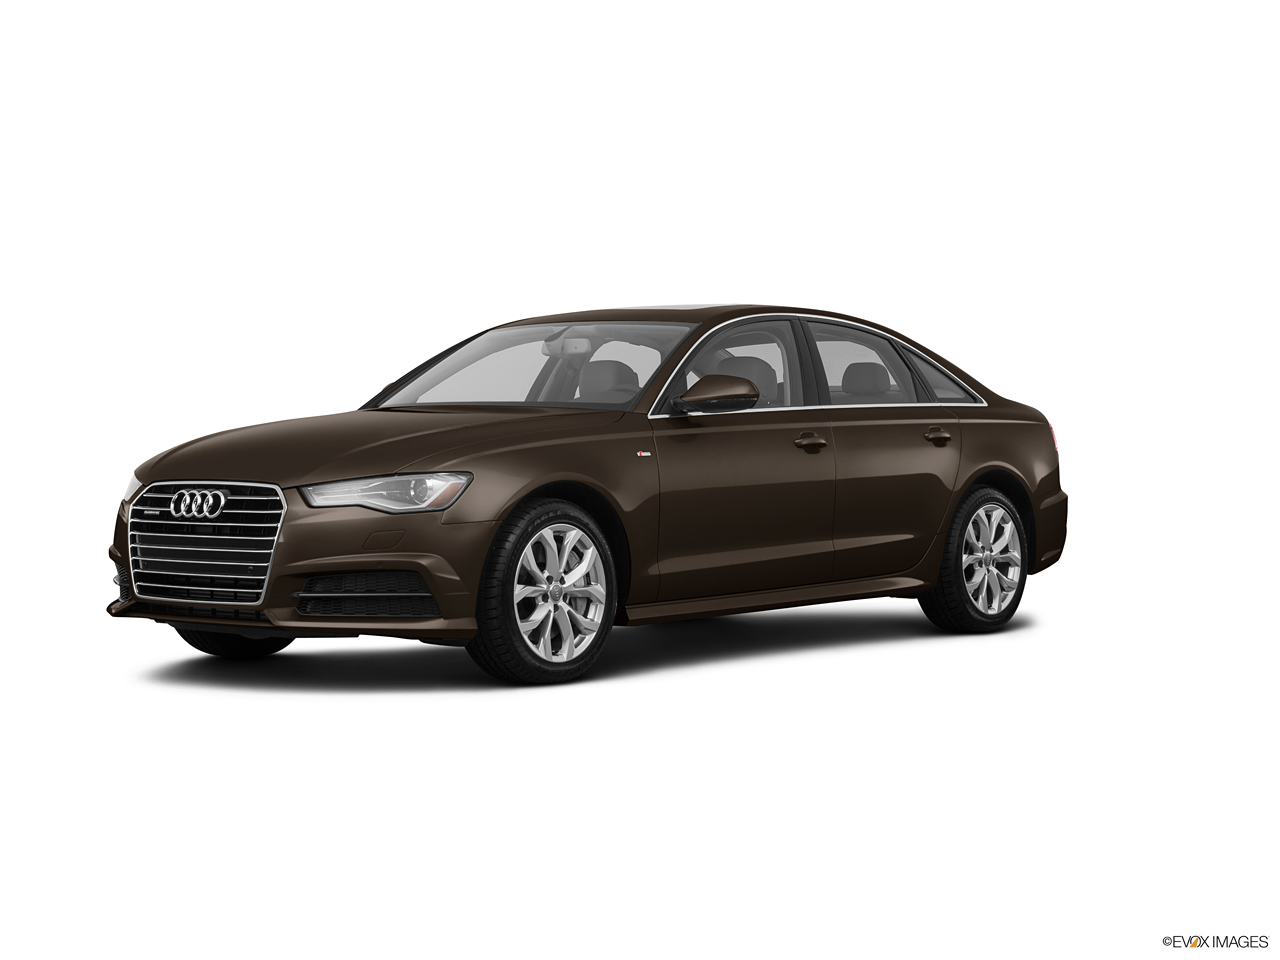 audi a6 2017 35 fsi quattro 220 hp in bahrain new car. Black Bedroom Furniture Sets. Home Design Ideas